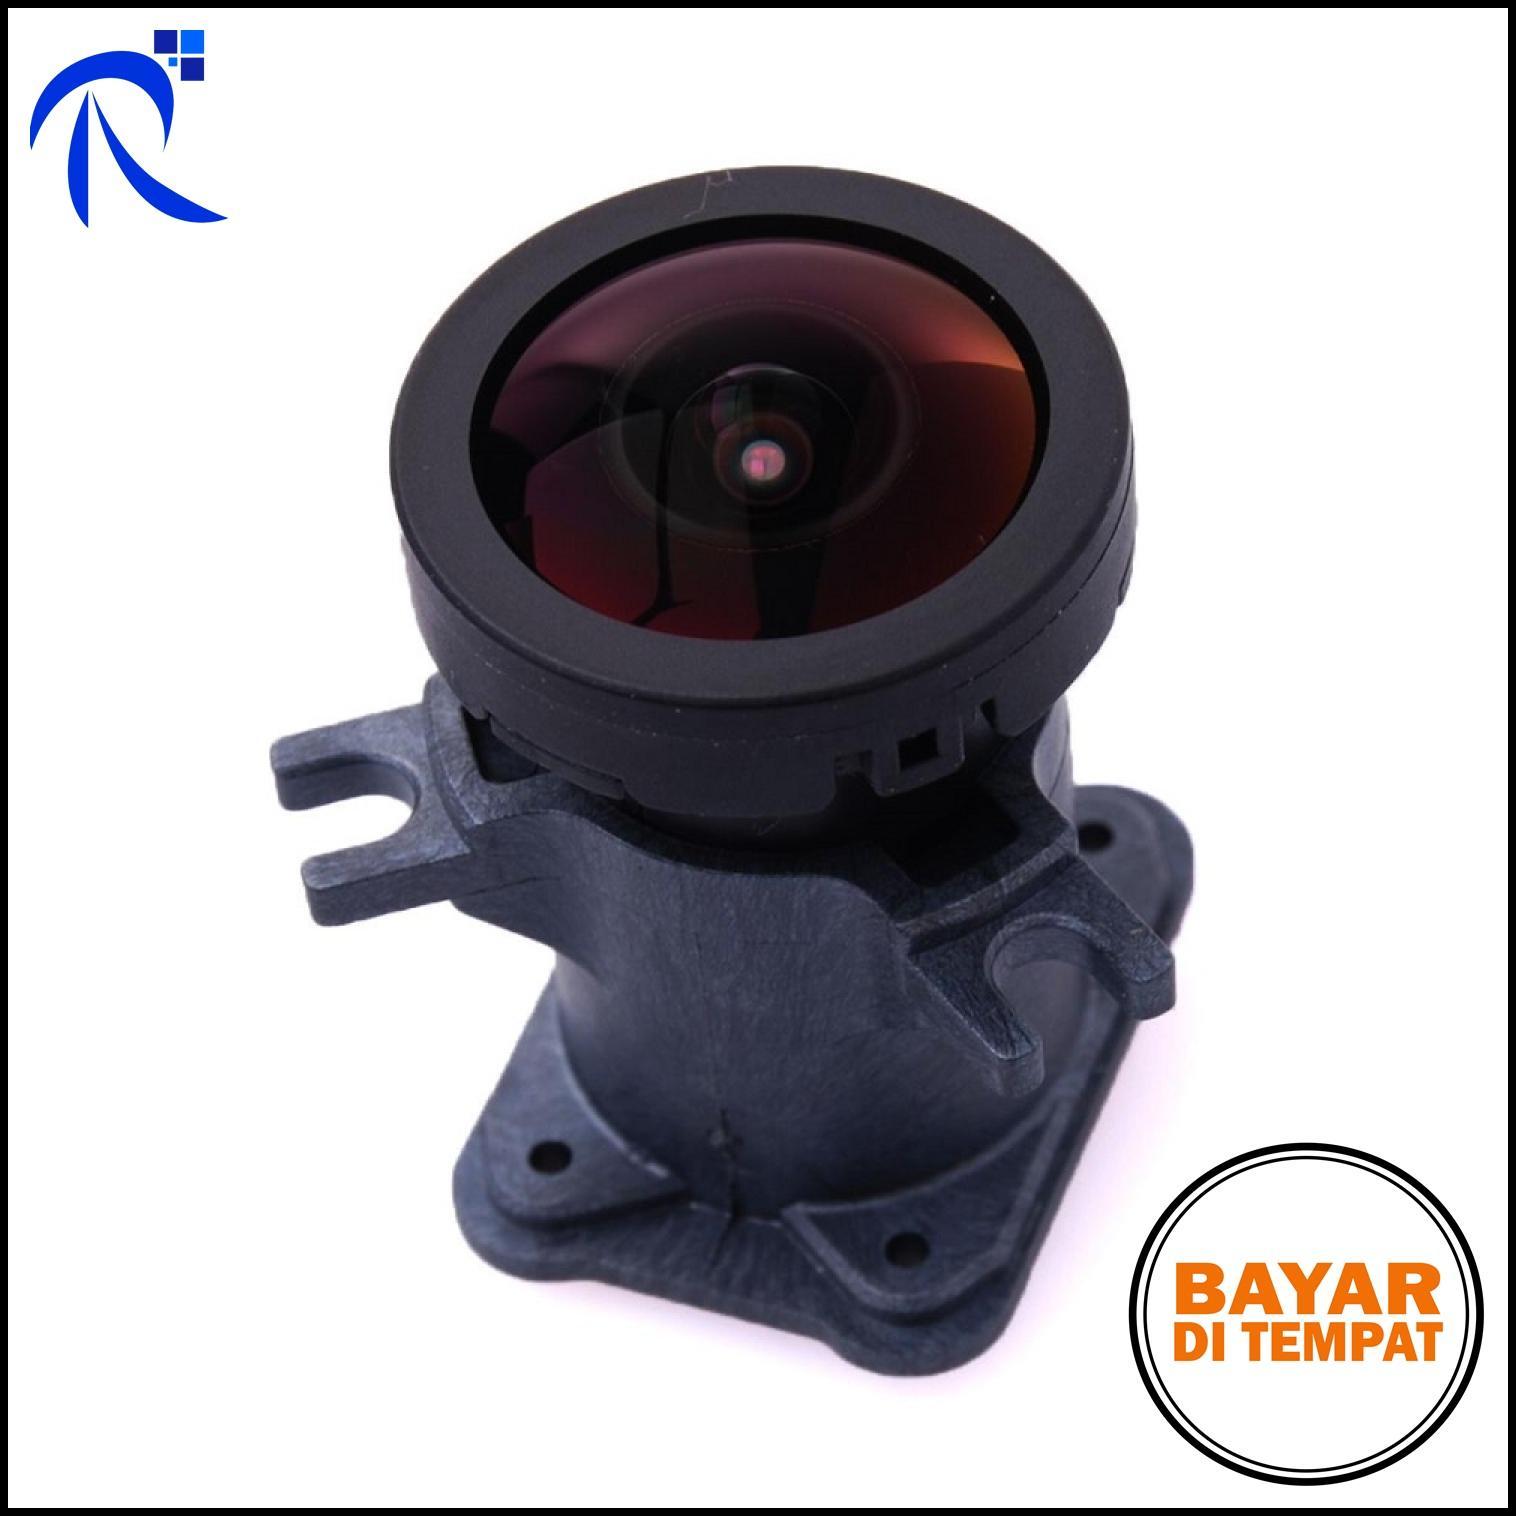 GoPro Lensa Replacement 1600W 170 Degree Wide Angle For Gopro Hero 3/3+/4 - Black / Hitam Lensa Pengganti Rusak Jangkauan pandang Jauh Berkualitas BISA COD !!